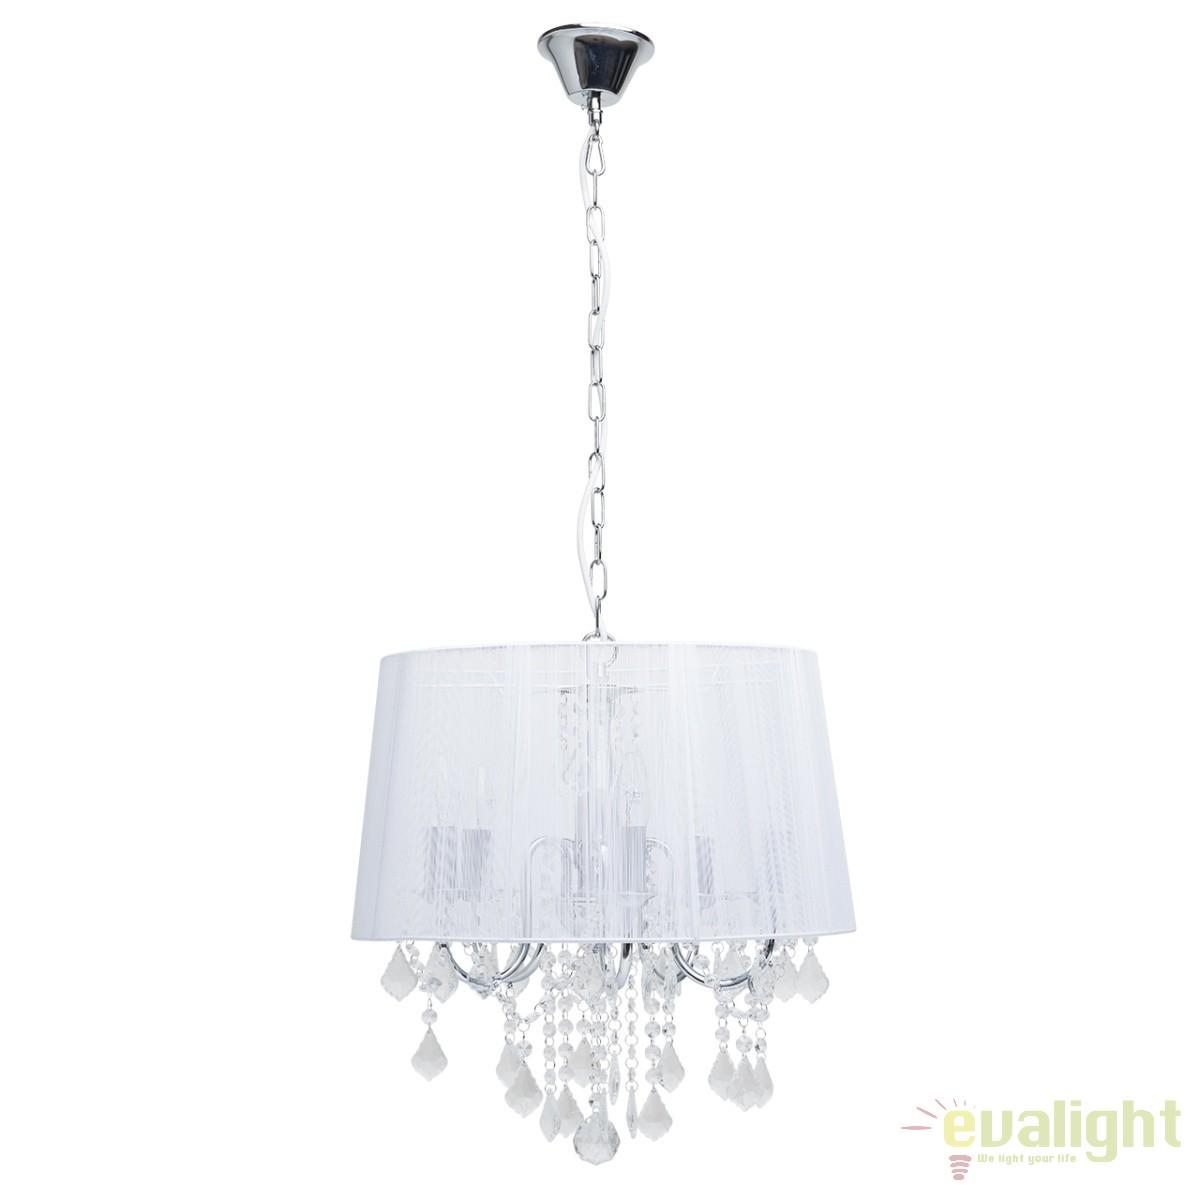 lustra eleganta cu fir de matase alb federica 379017805 mw corpuri de iluminat lustre aplice. Black Bedroom Furniture Sets. Home Design Ideas